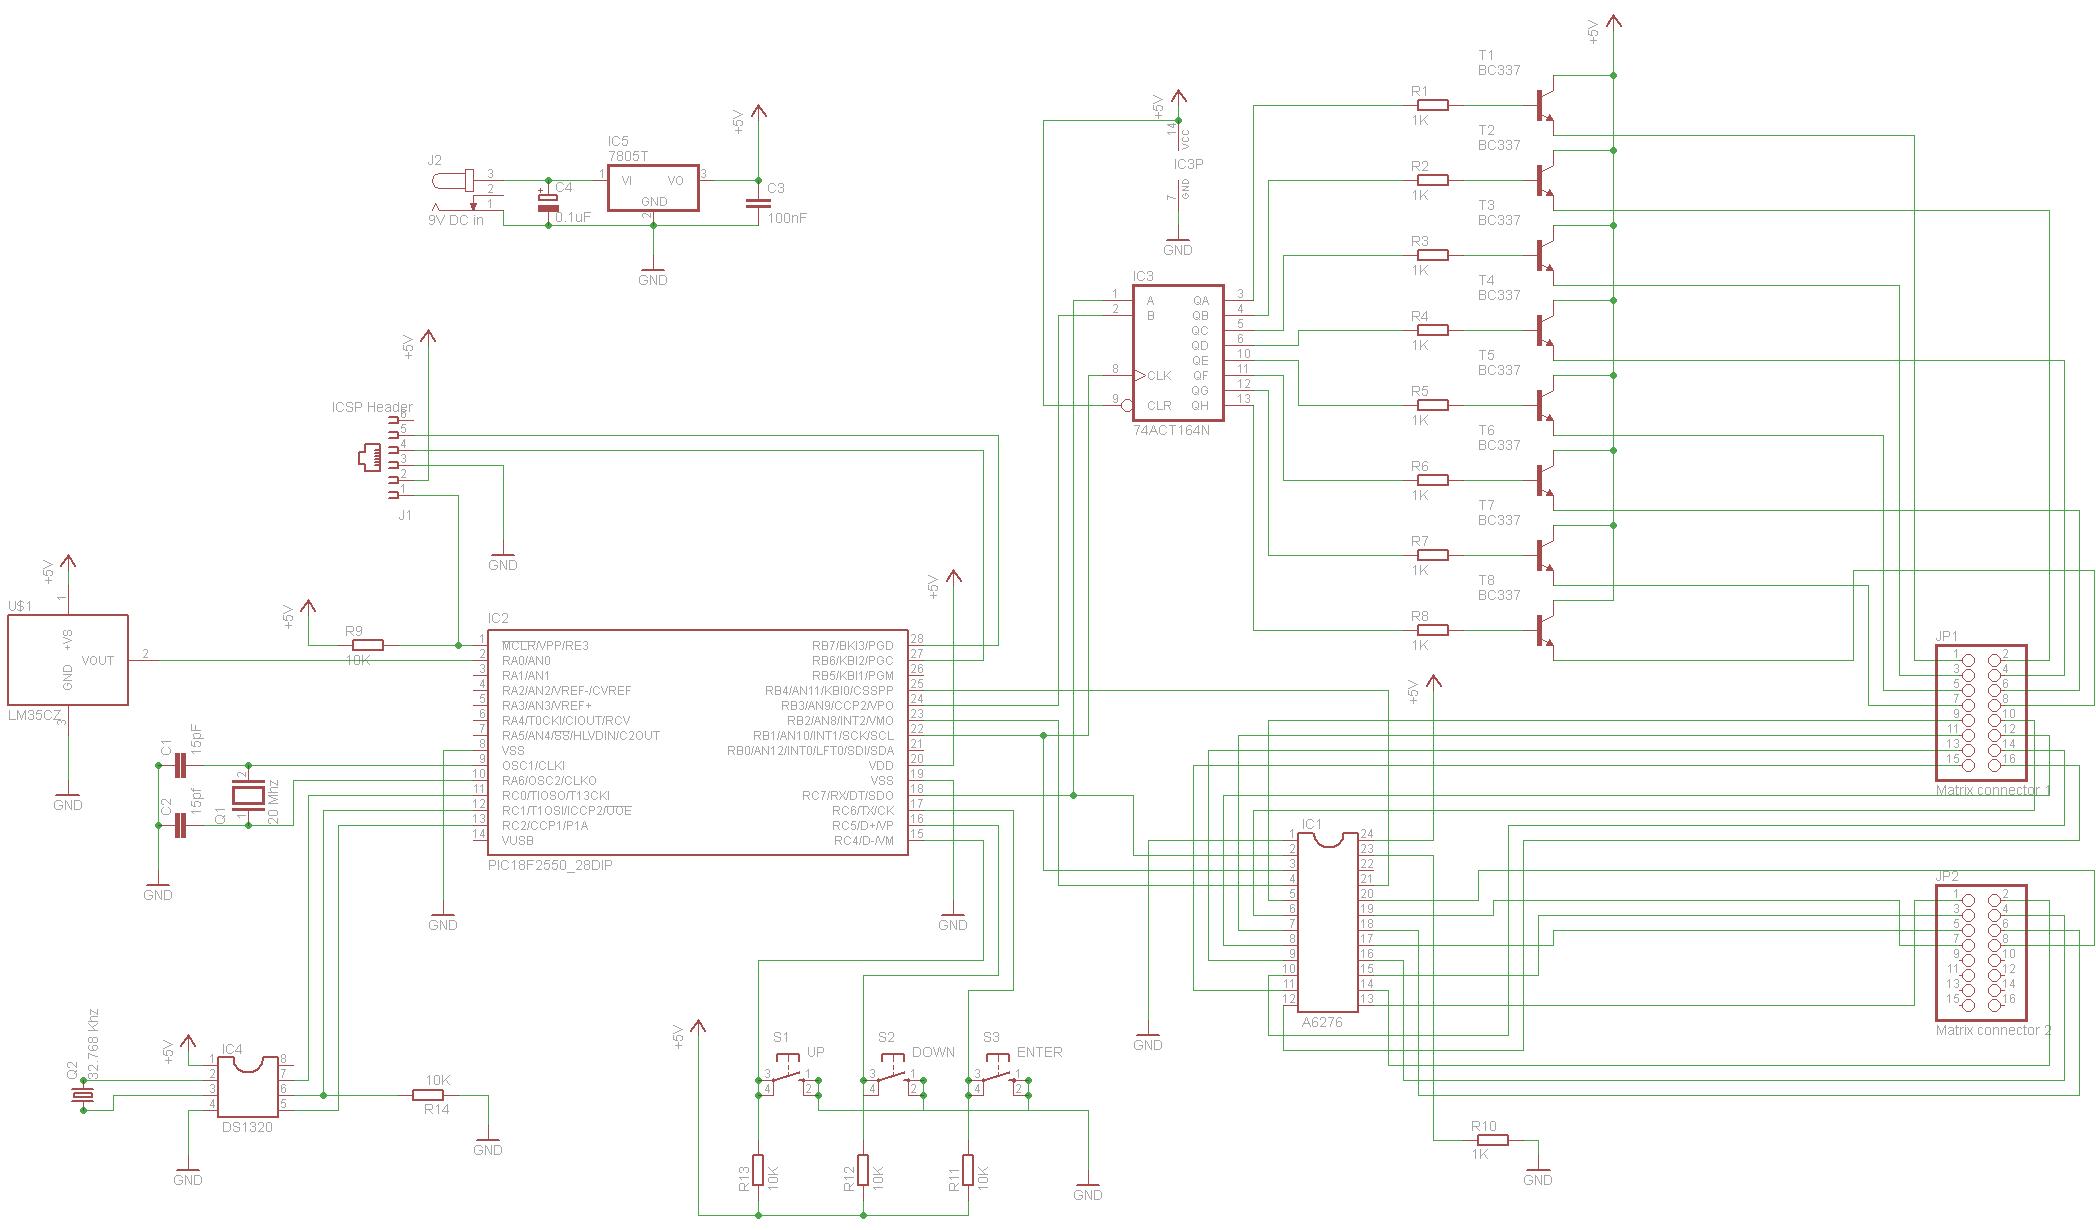 16x8 led matrix display